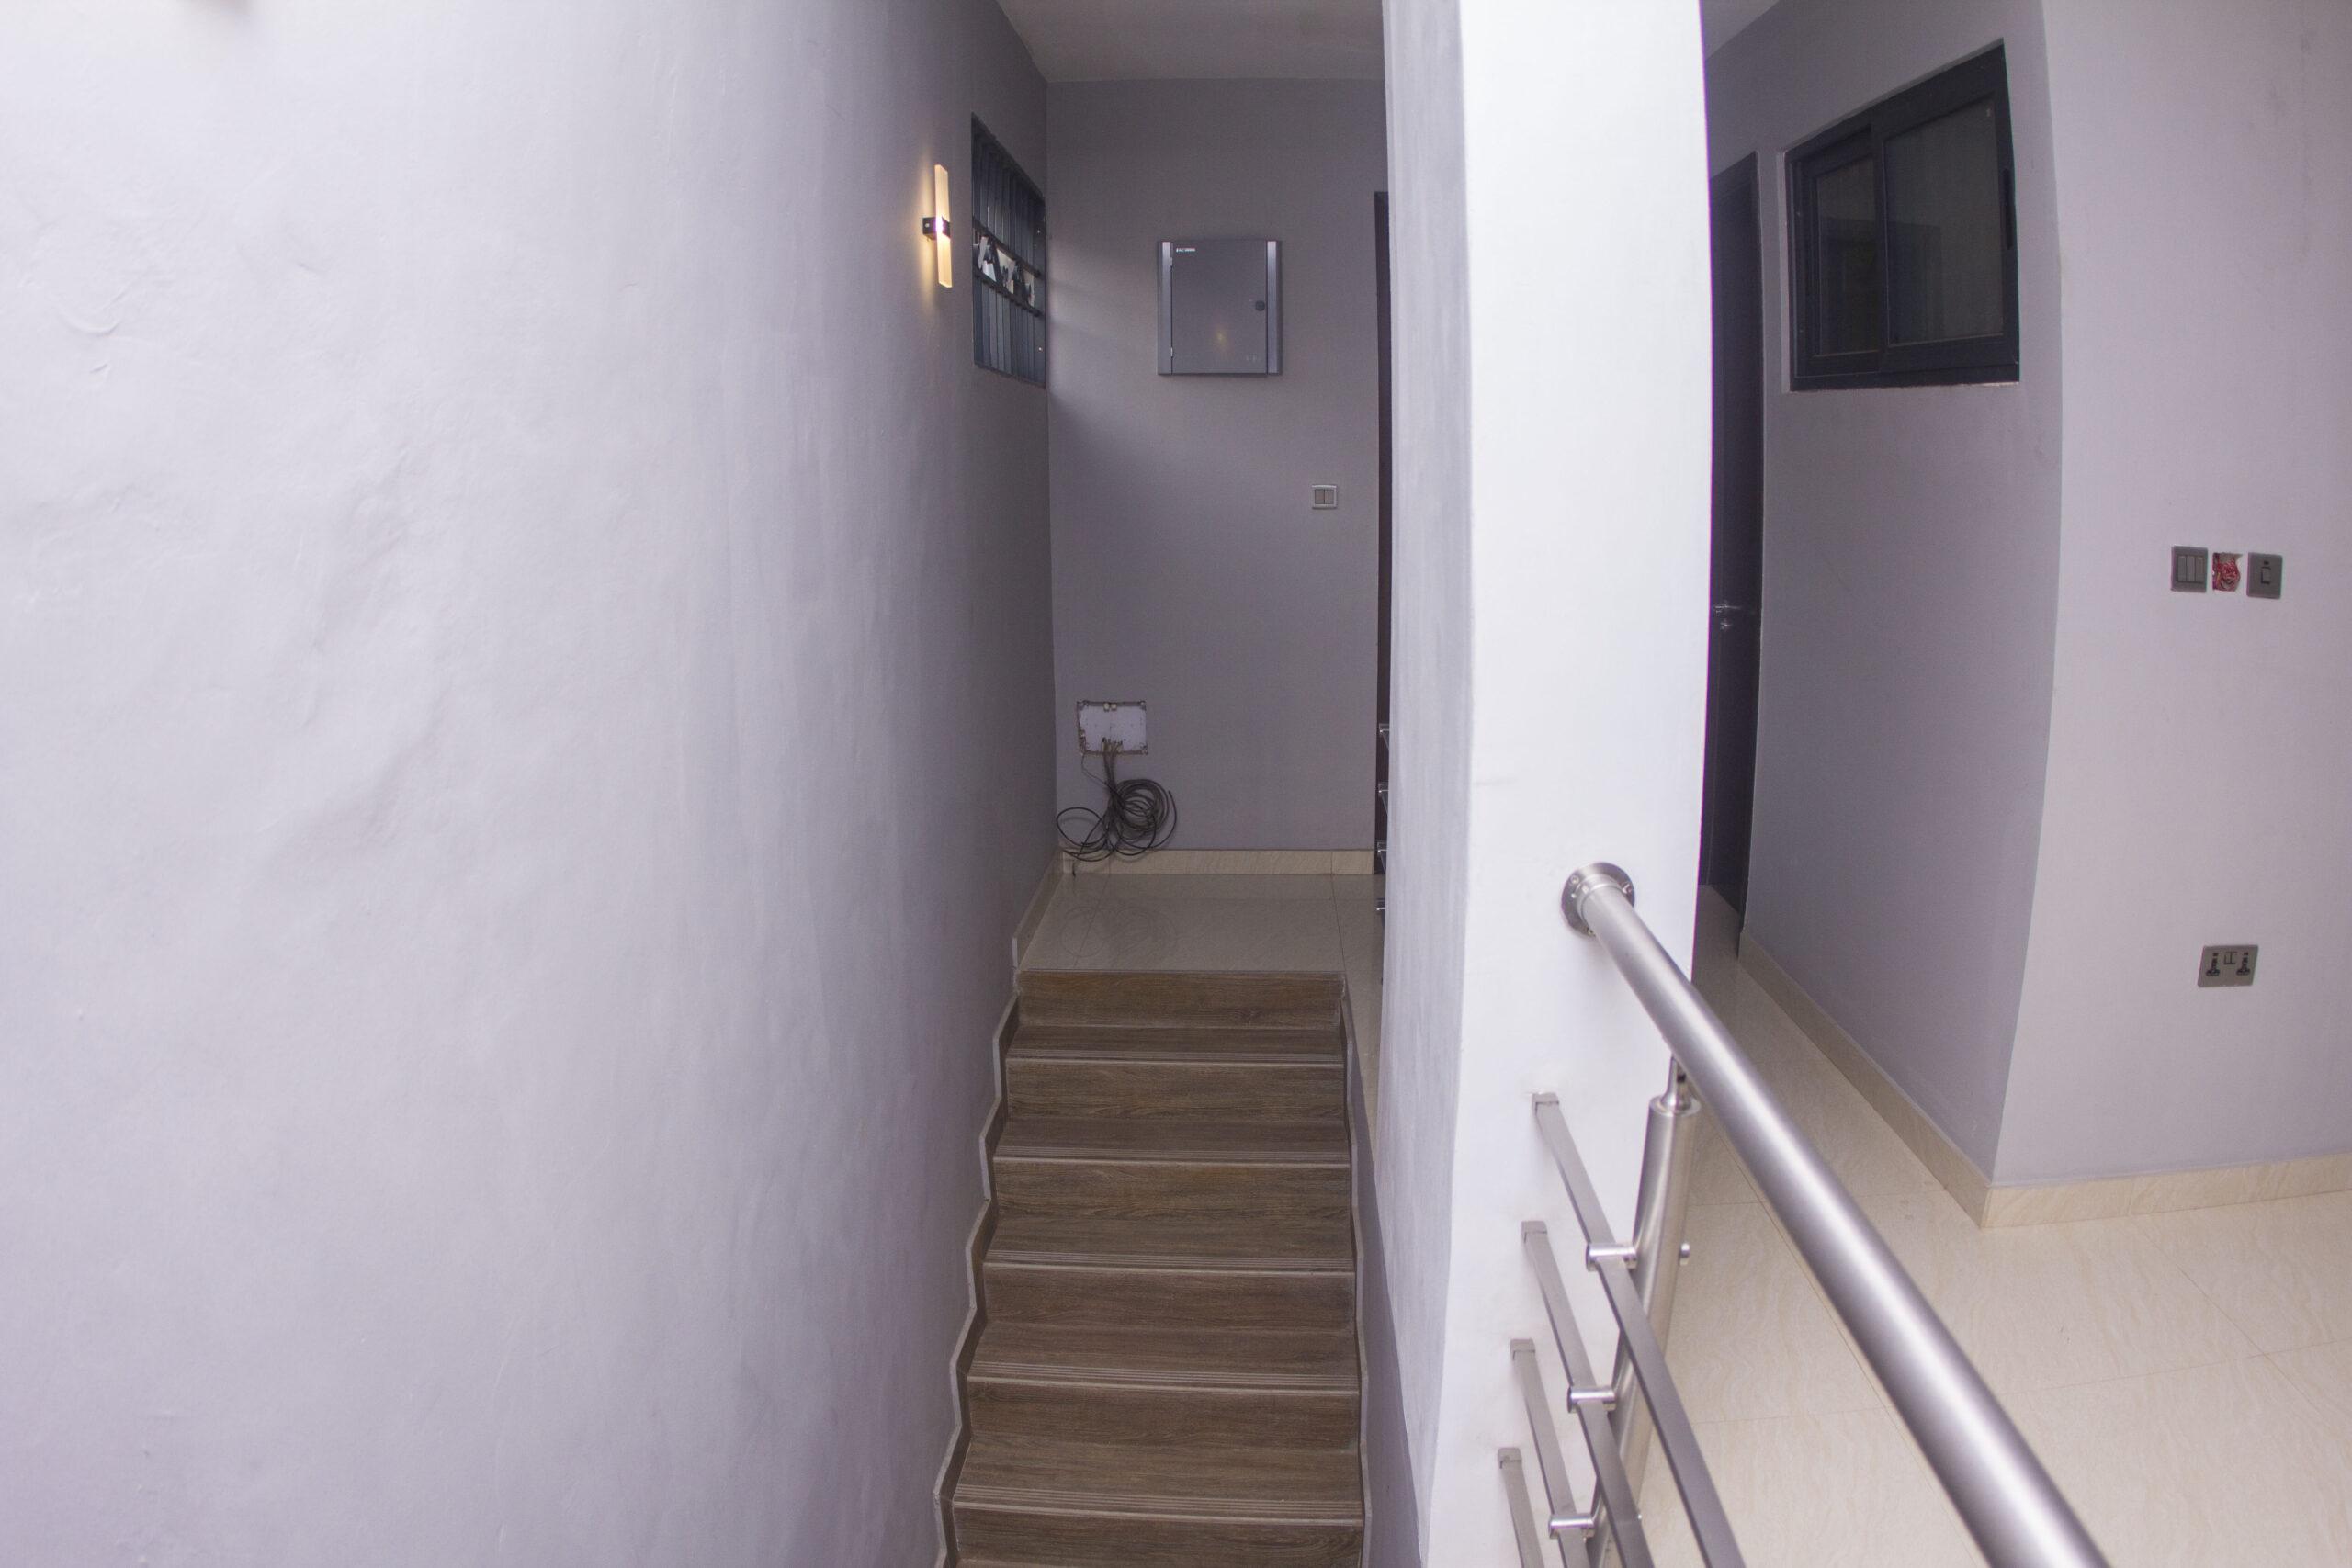 4 BEDROOM HOUSE FOR SALE IN AYI MENSAH